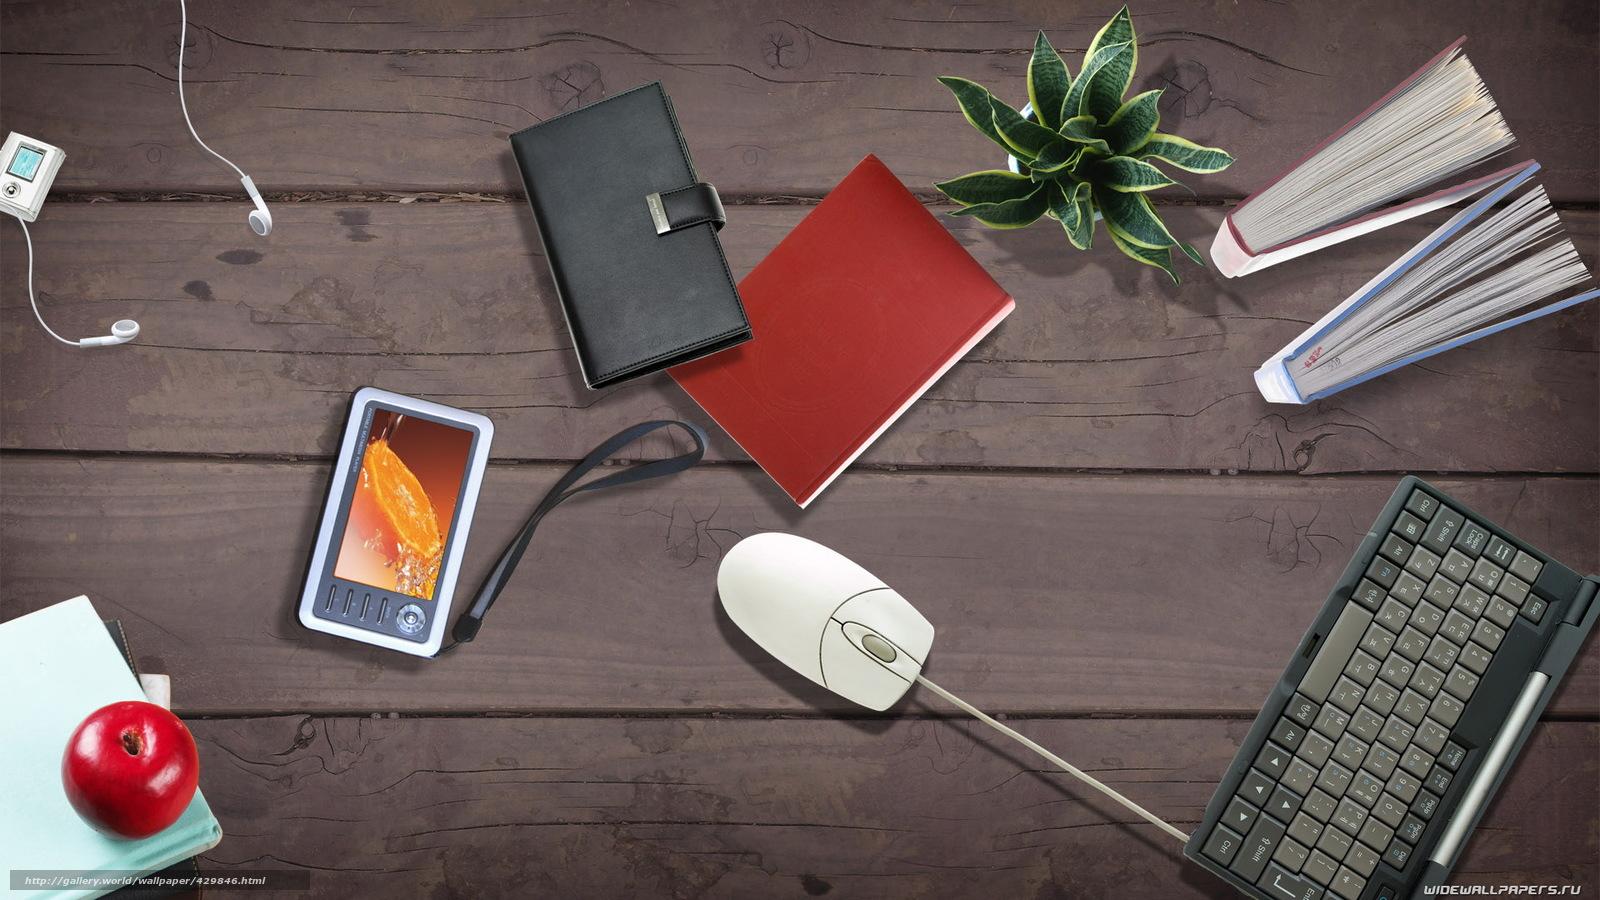 Download wallpaper computer mouse office desk flower free